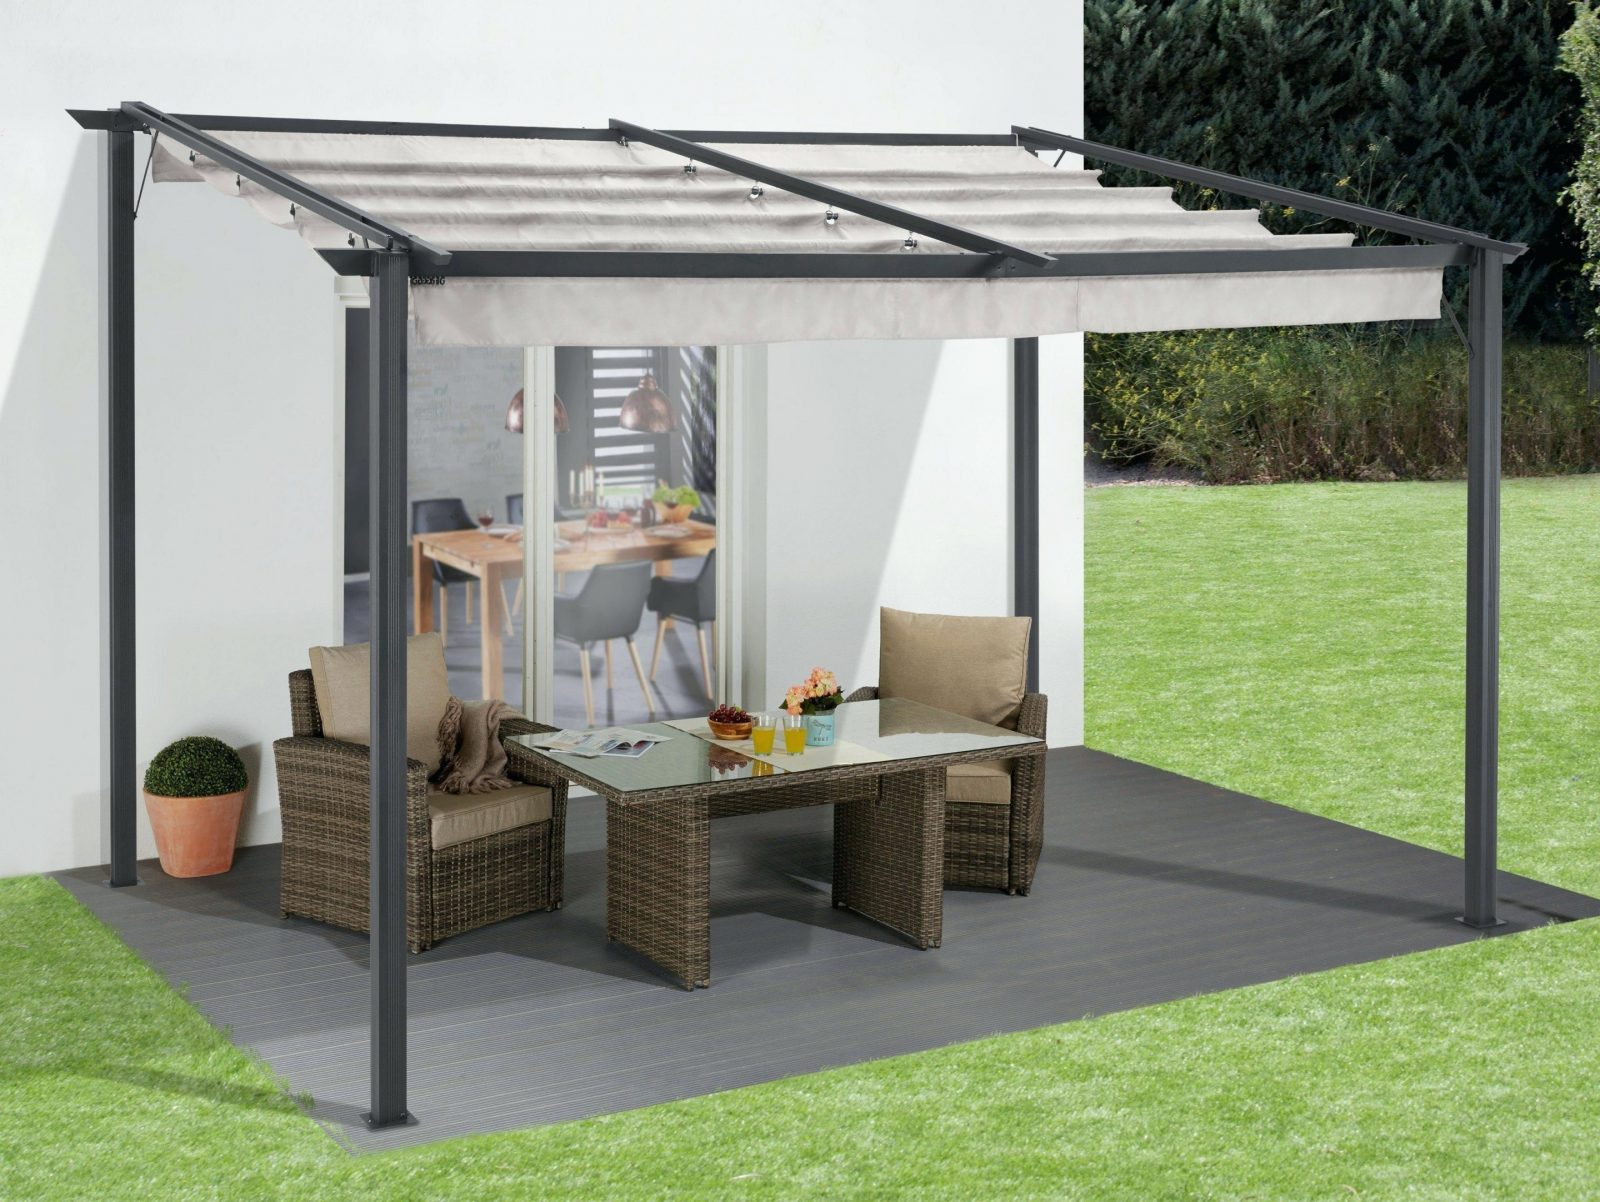 Gartenpavillon 4X4M 4×4 Holz Garten Pavillon Meter – Vstepontario von Pavillon 4 X 4 M Wasserdicht Photo